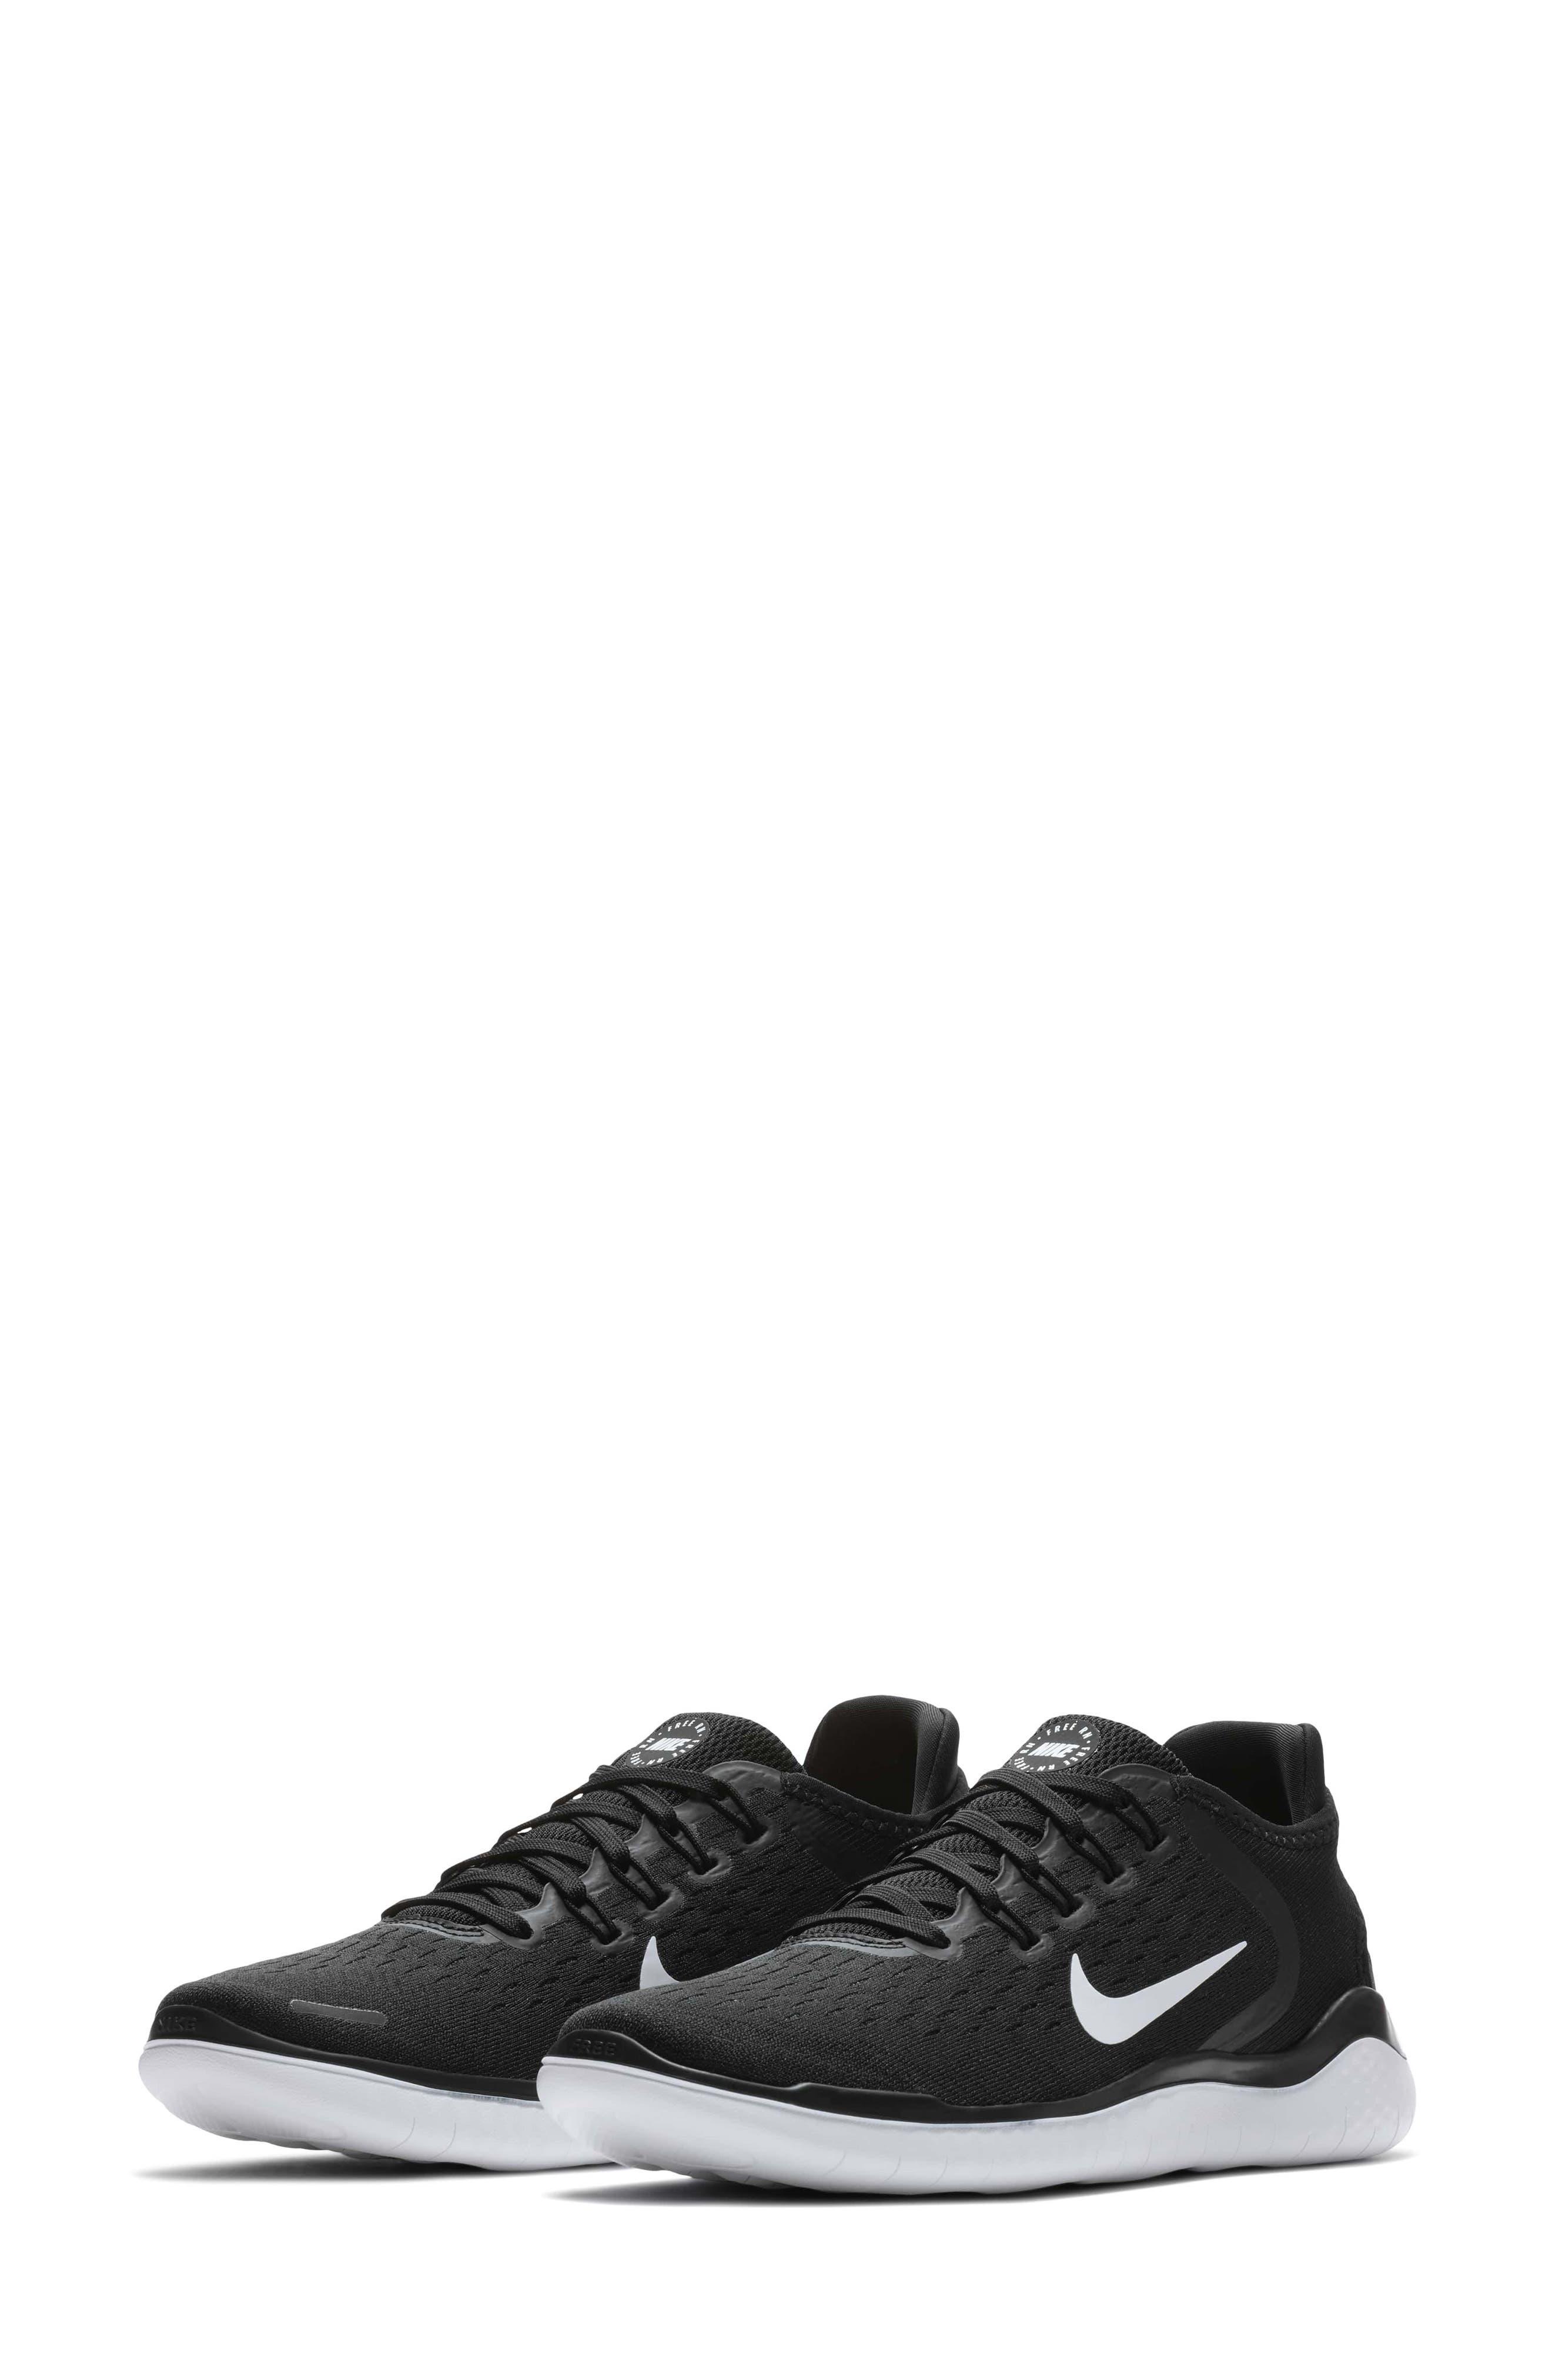 NIKE Free RN 2018 Running Shoe, Main, color, BLACK/ WHITE